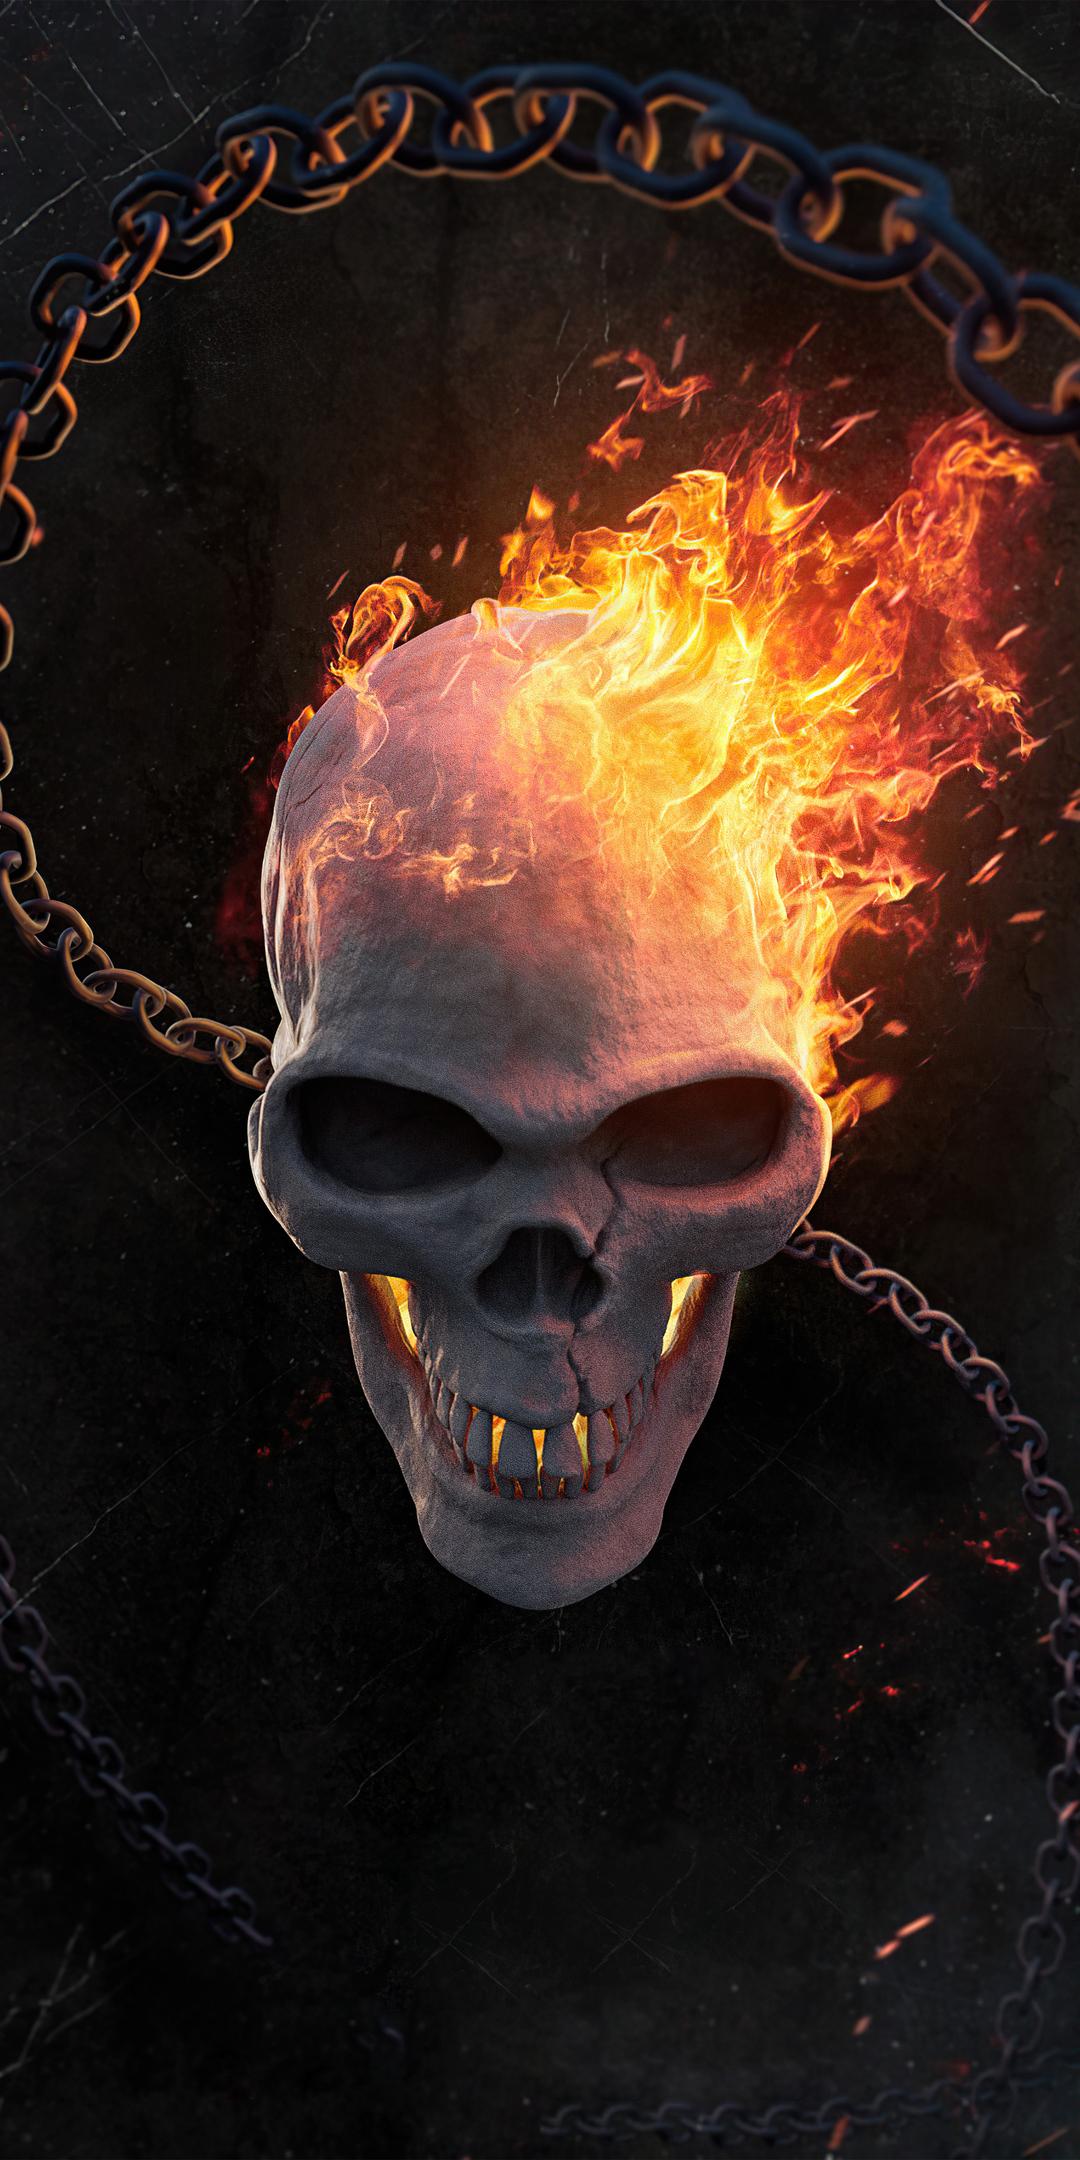 ghost-rider-burning-5k-86.jpg